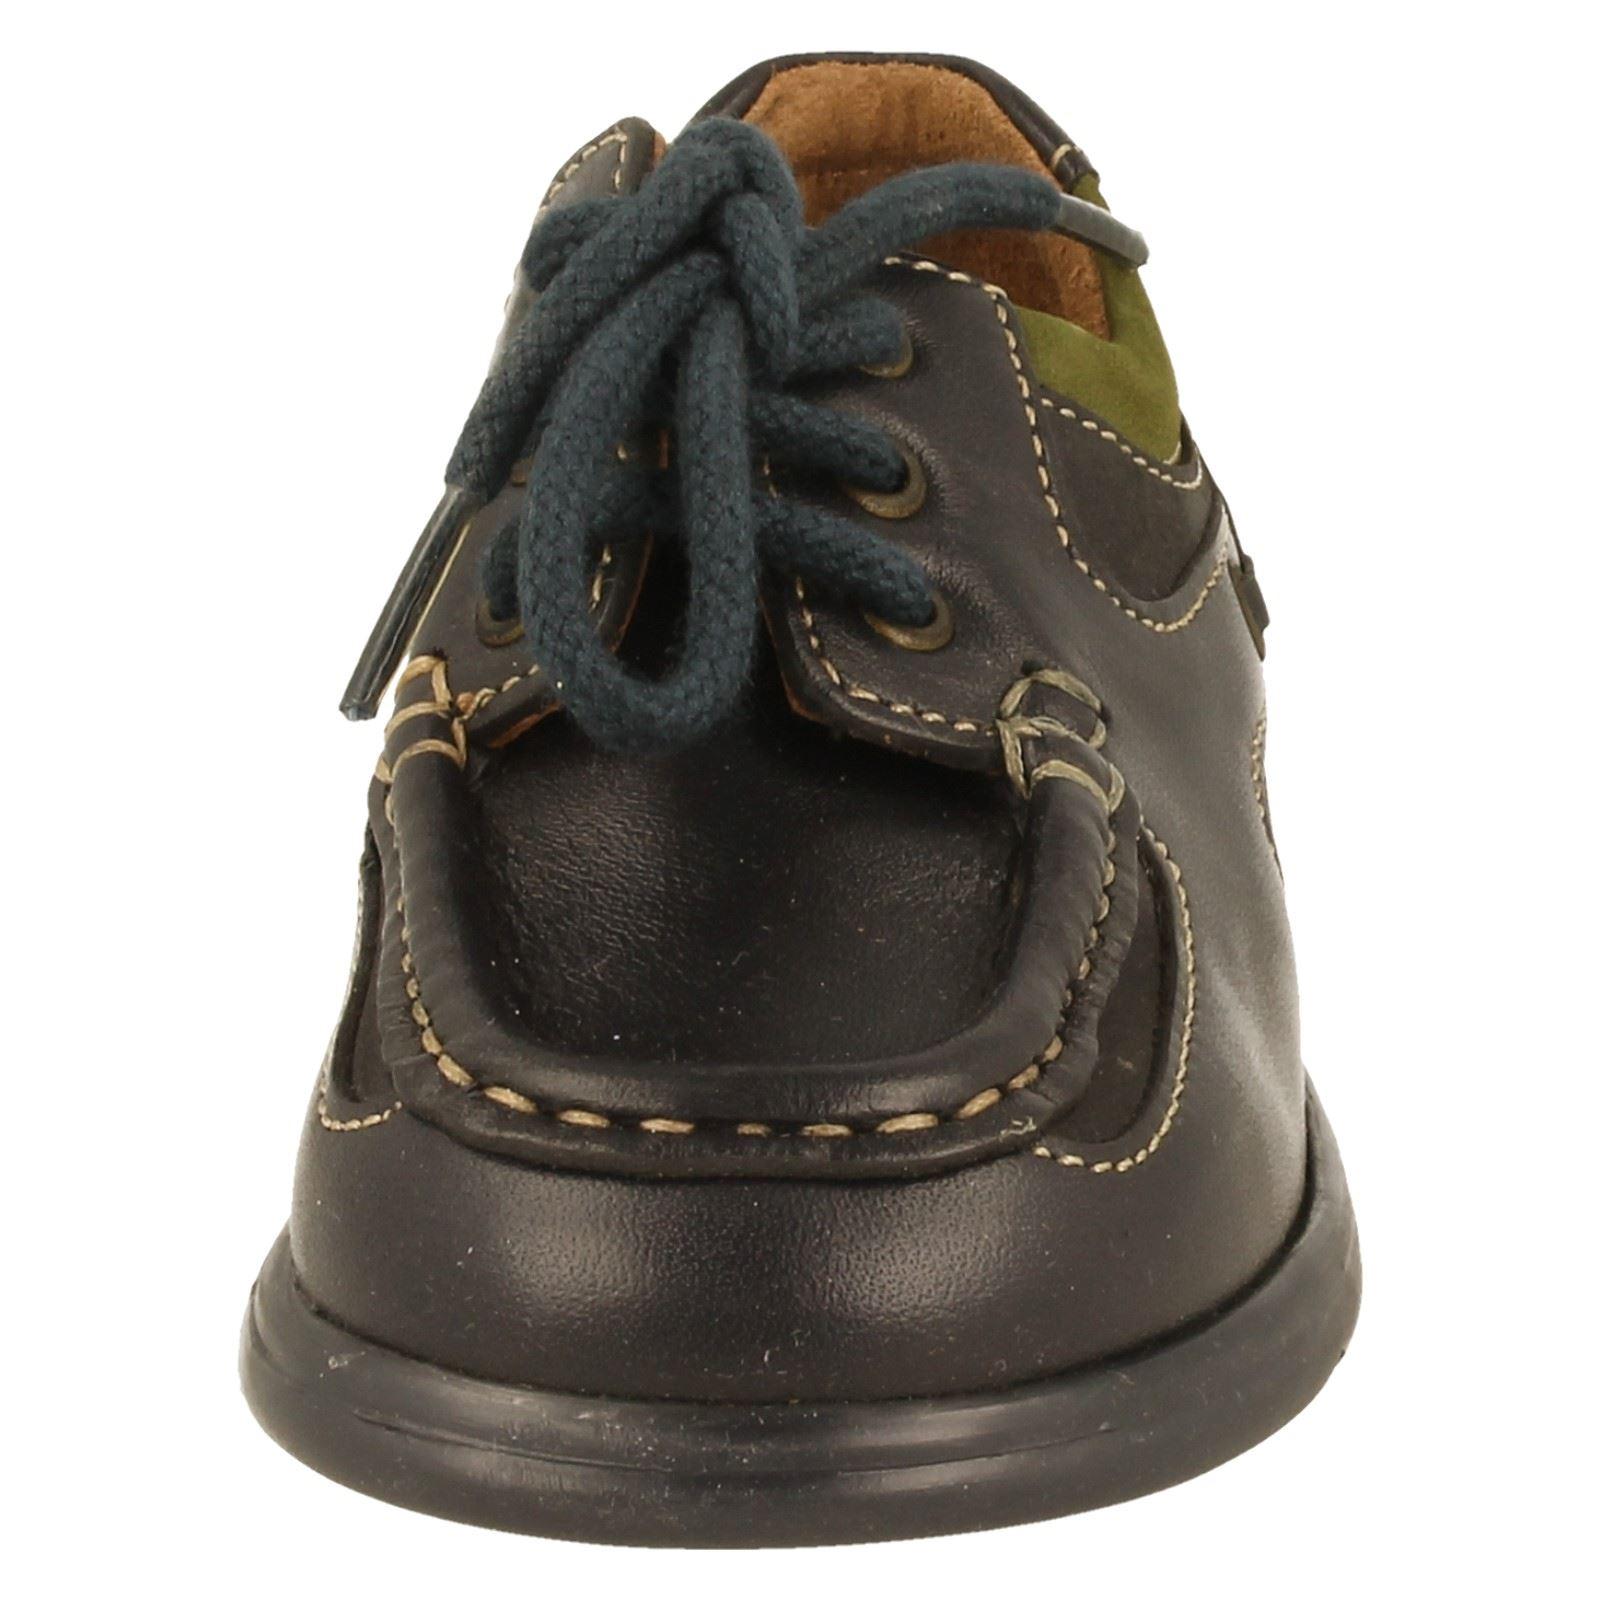 Boys Start Rite First Shoes Label Bam Bam -W